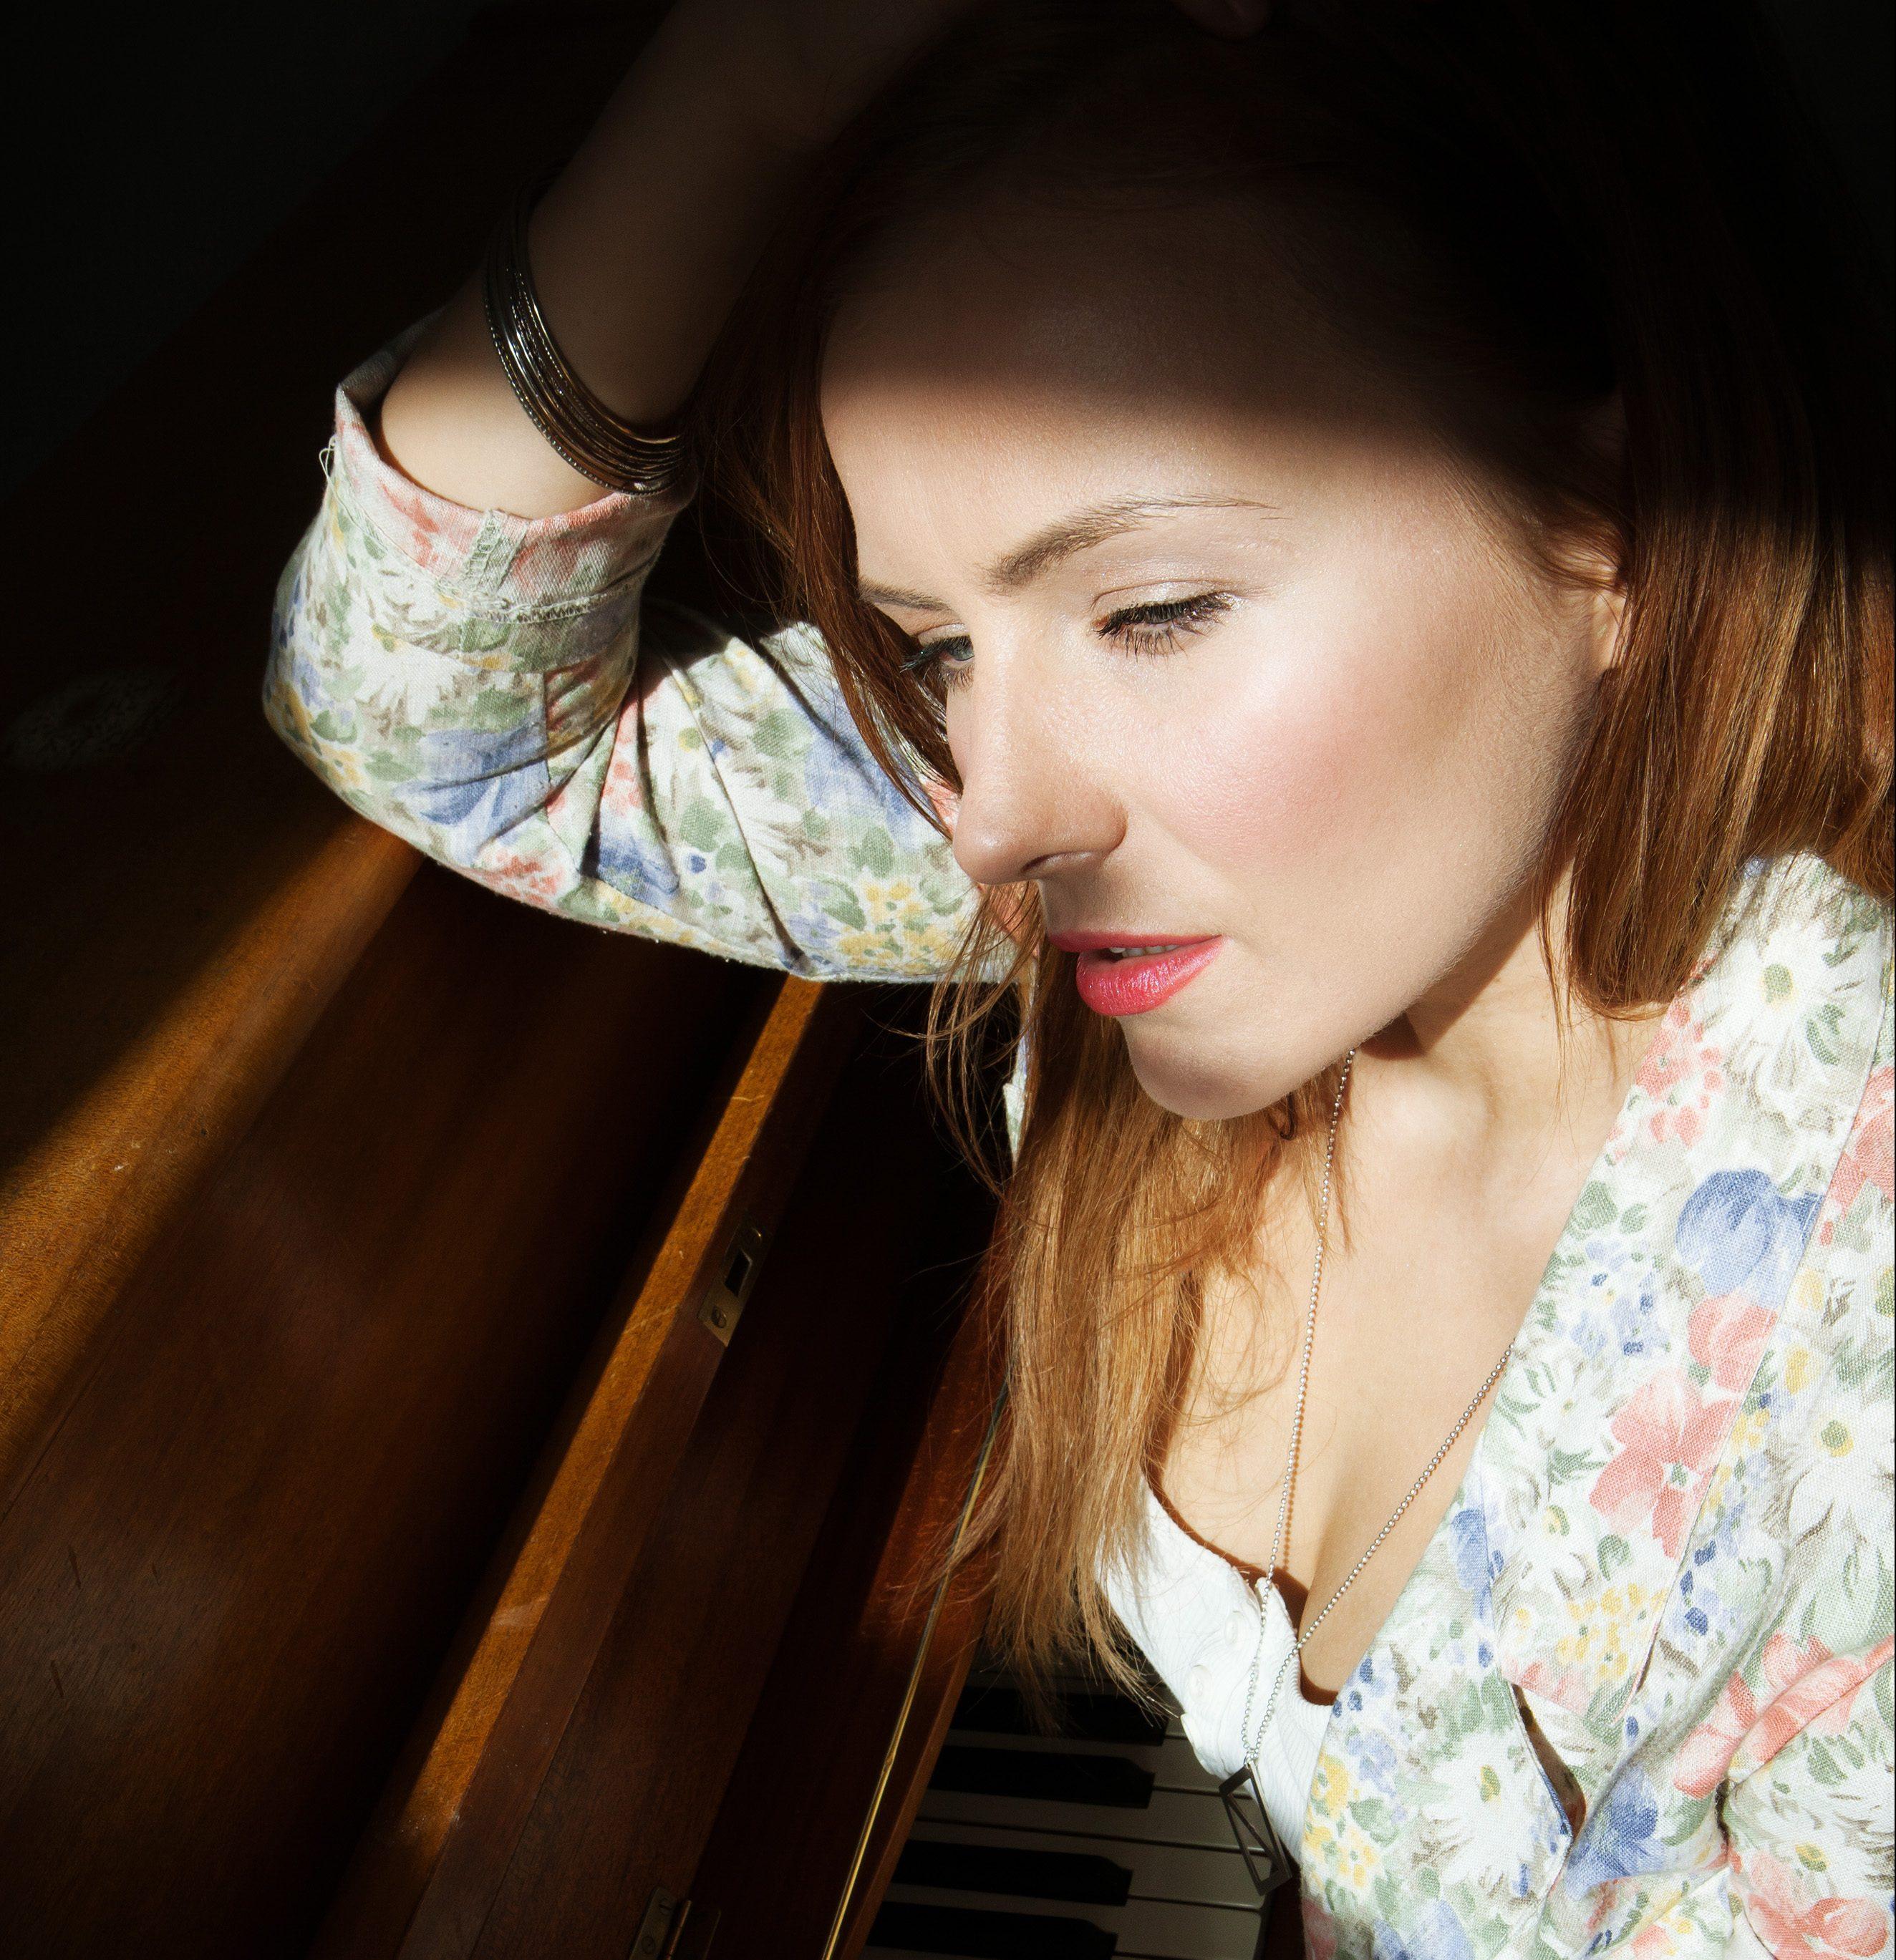 YONA_PIANO_1-11_Tiina Palm